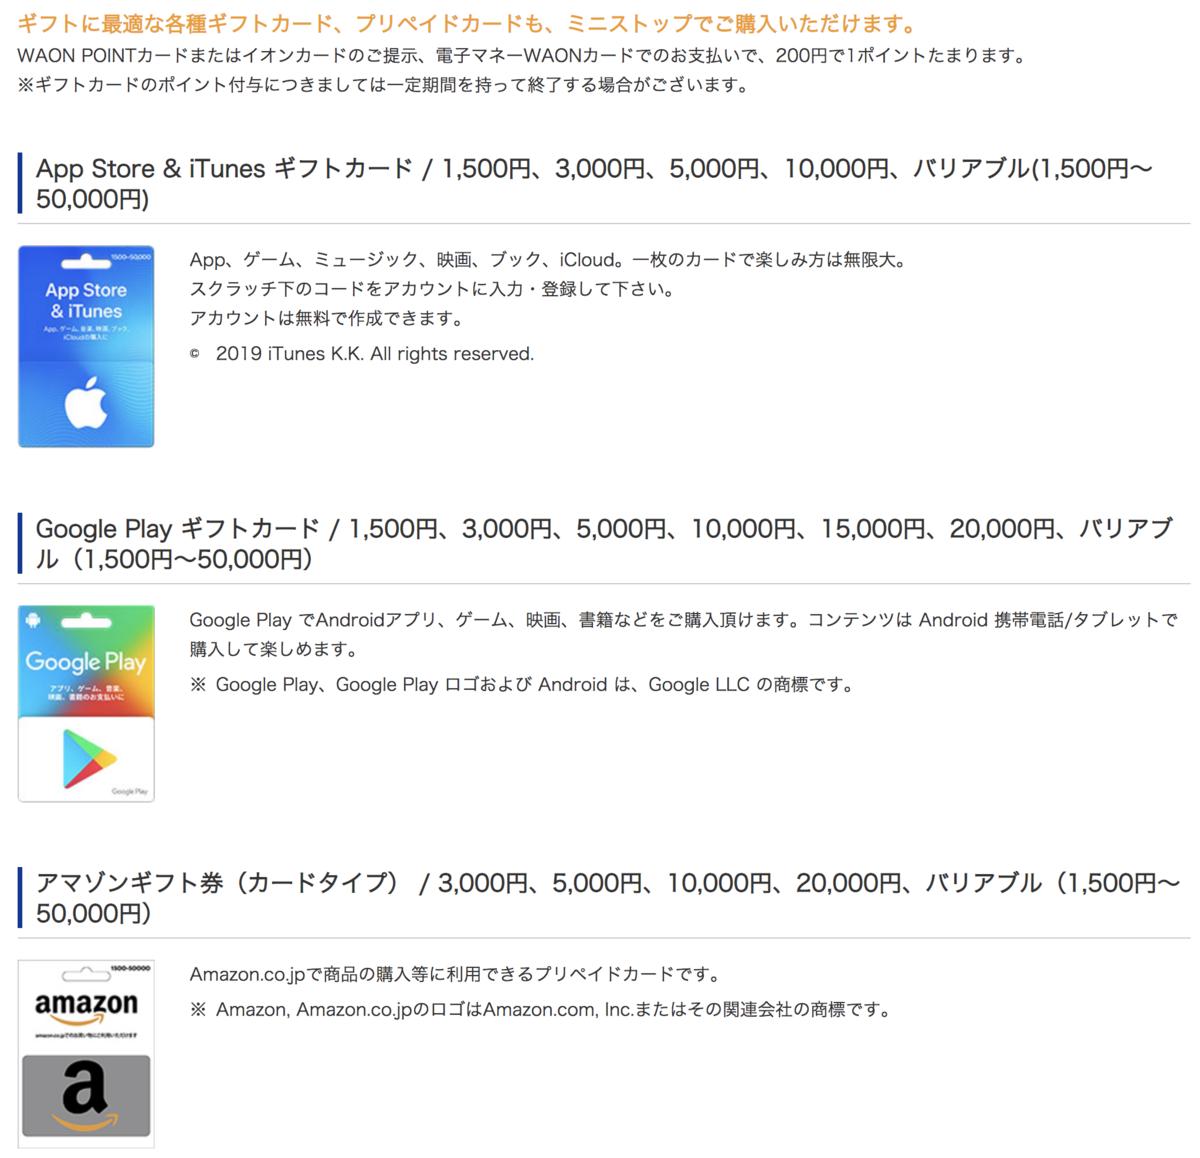 f:id:koiwai_chinatsu:20201205204141p:plain